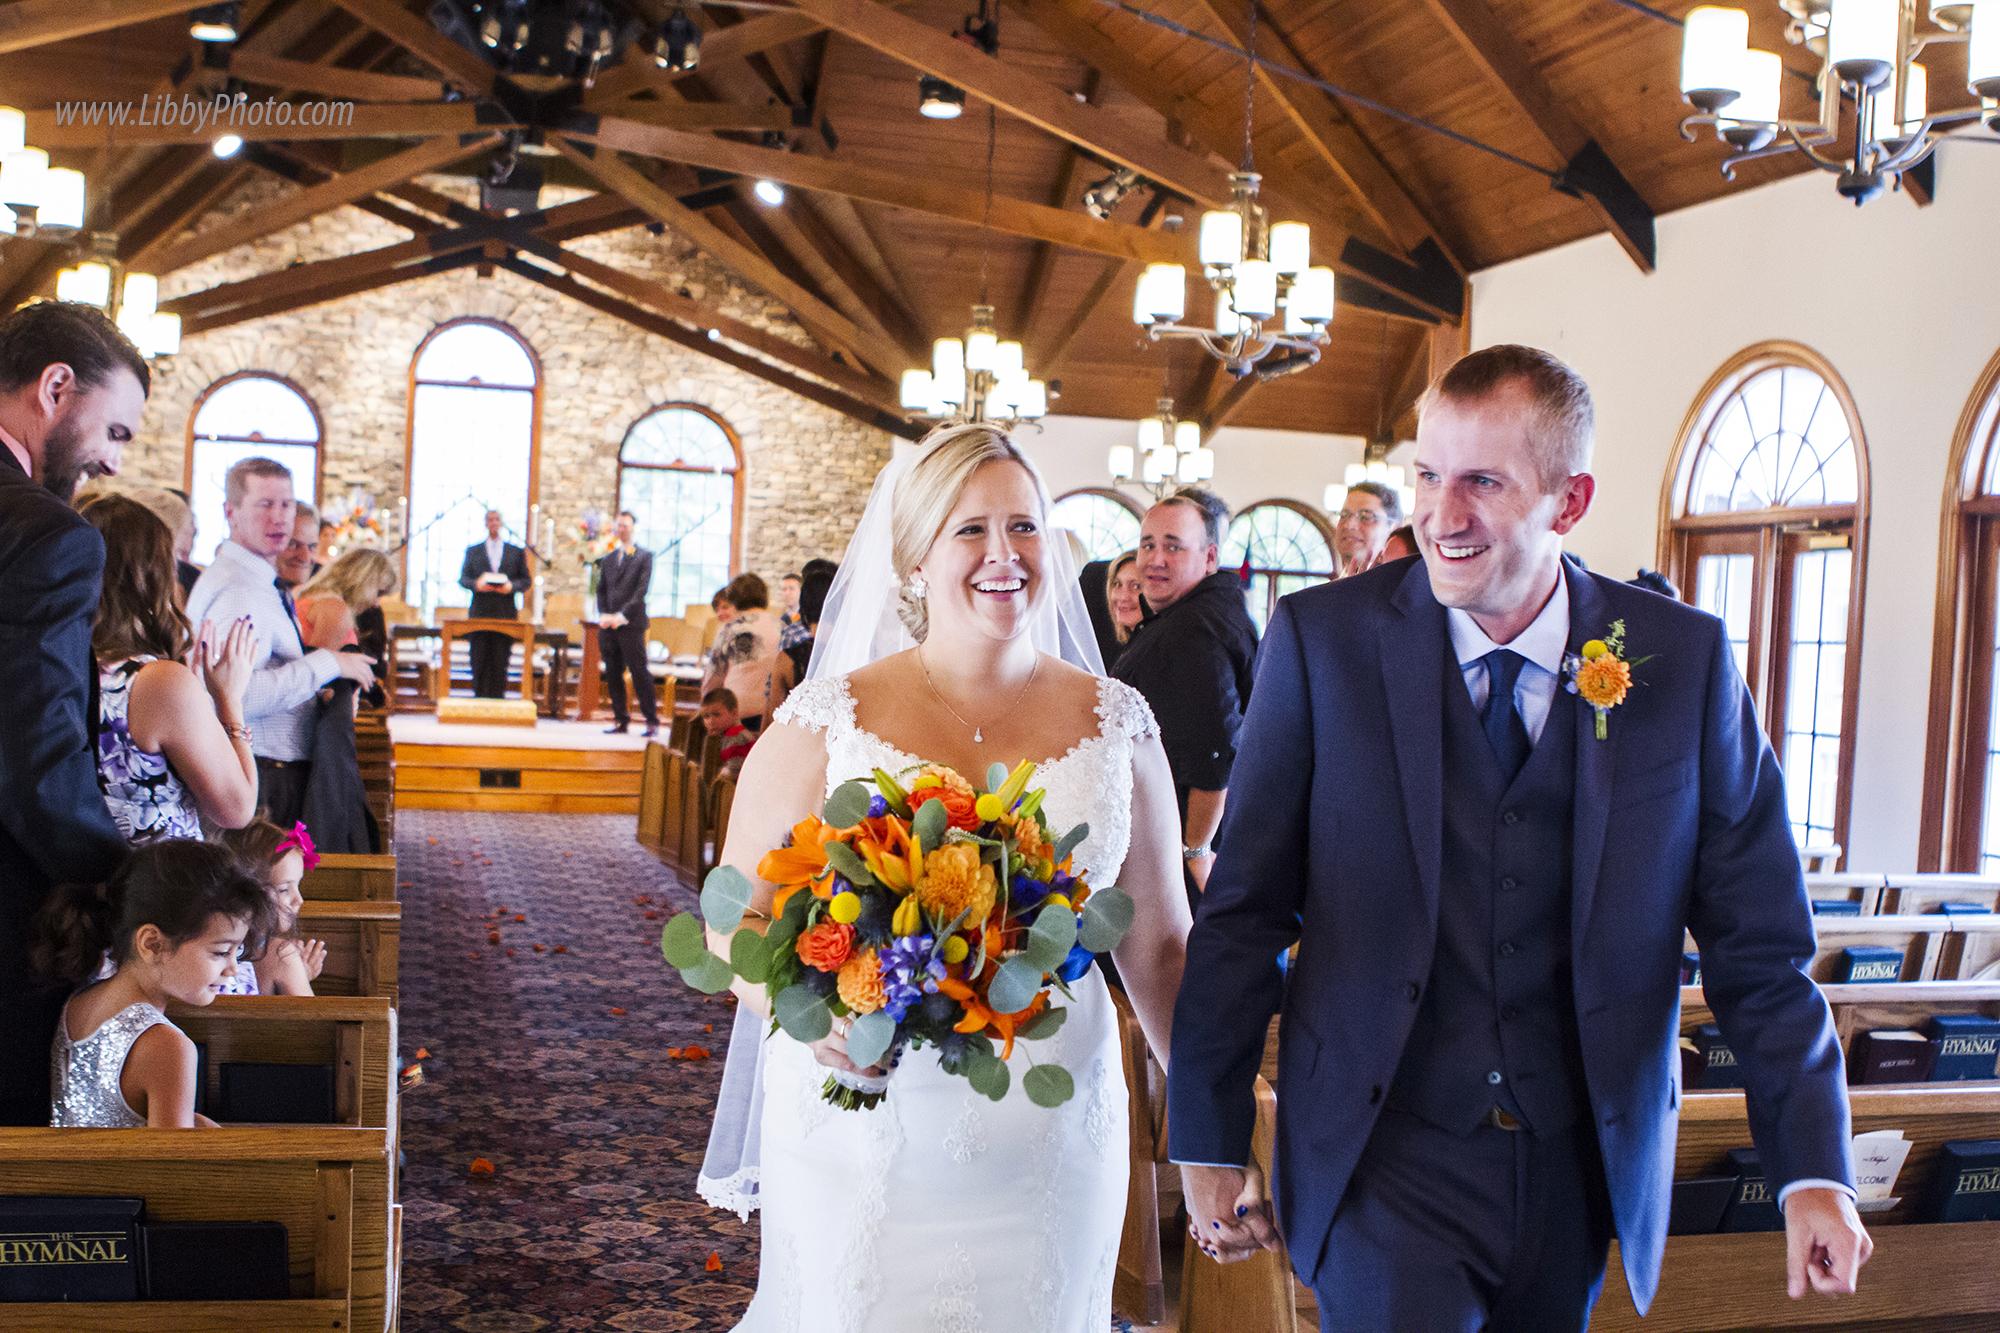 Atlanta wedding photography, Libbyphoto11 (10).jpg